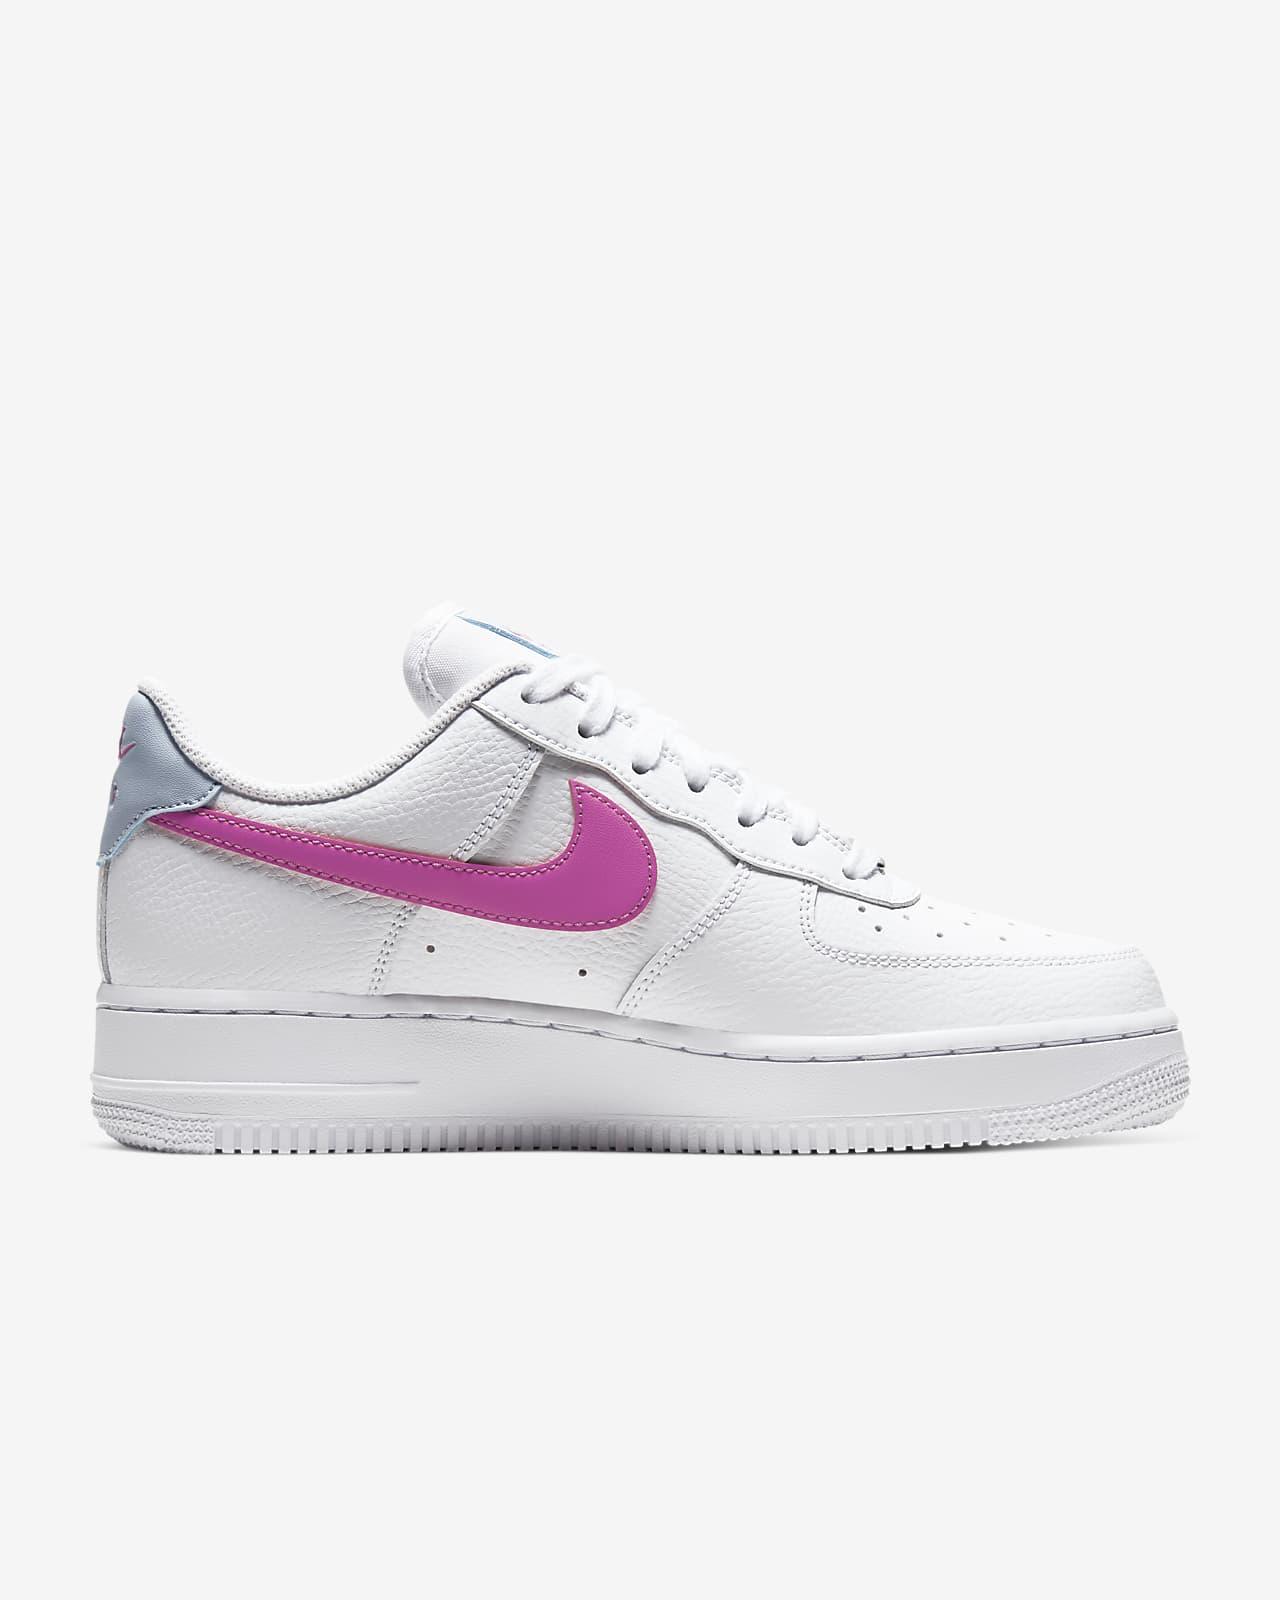 Nike Air Force 1 '07 Women's Shoe. Nike ID